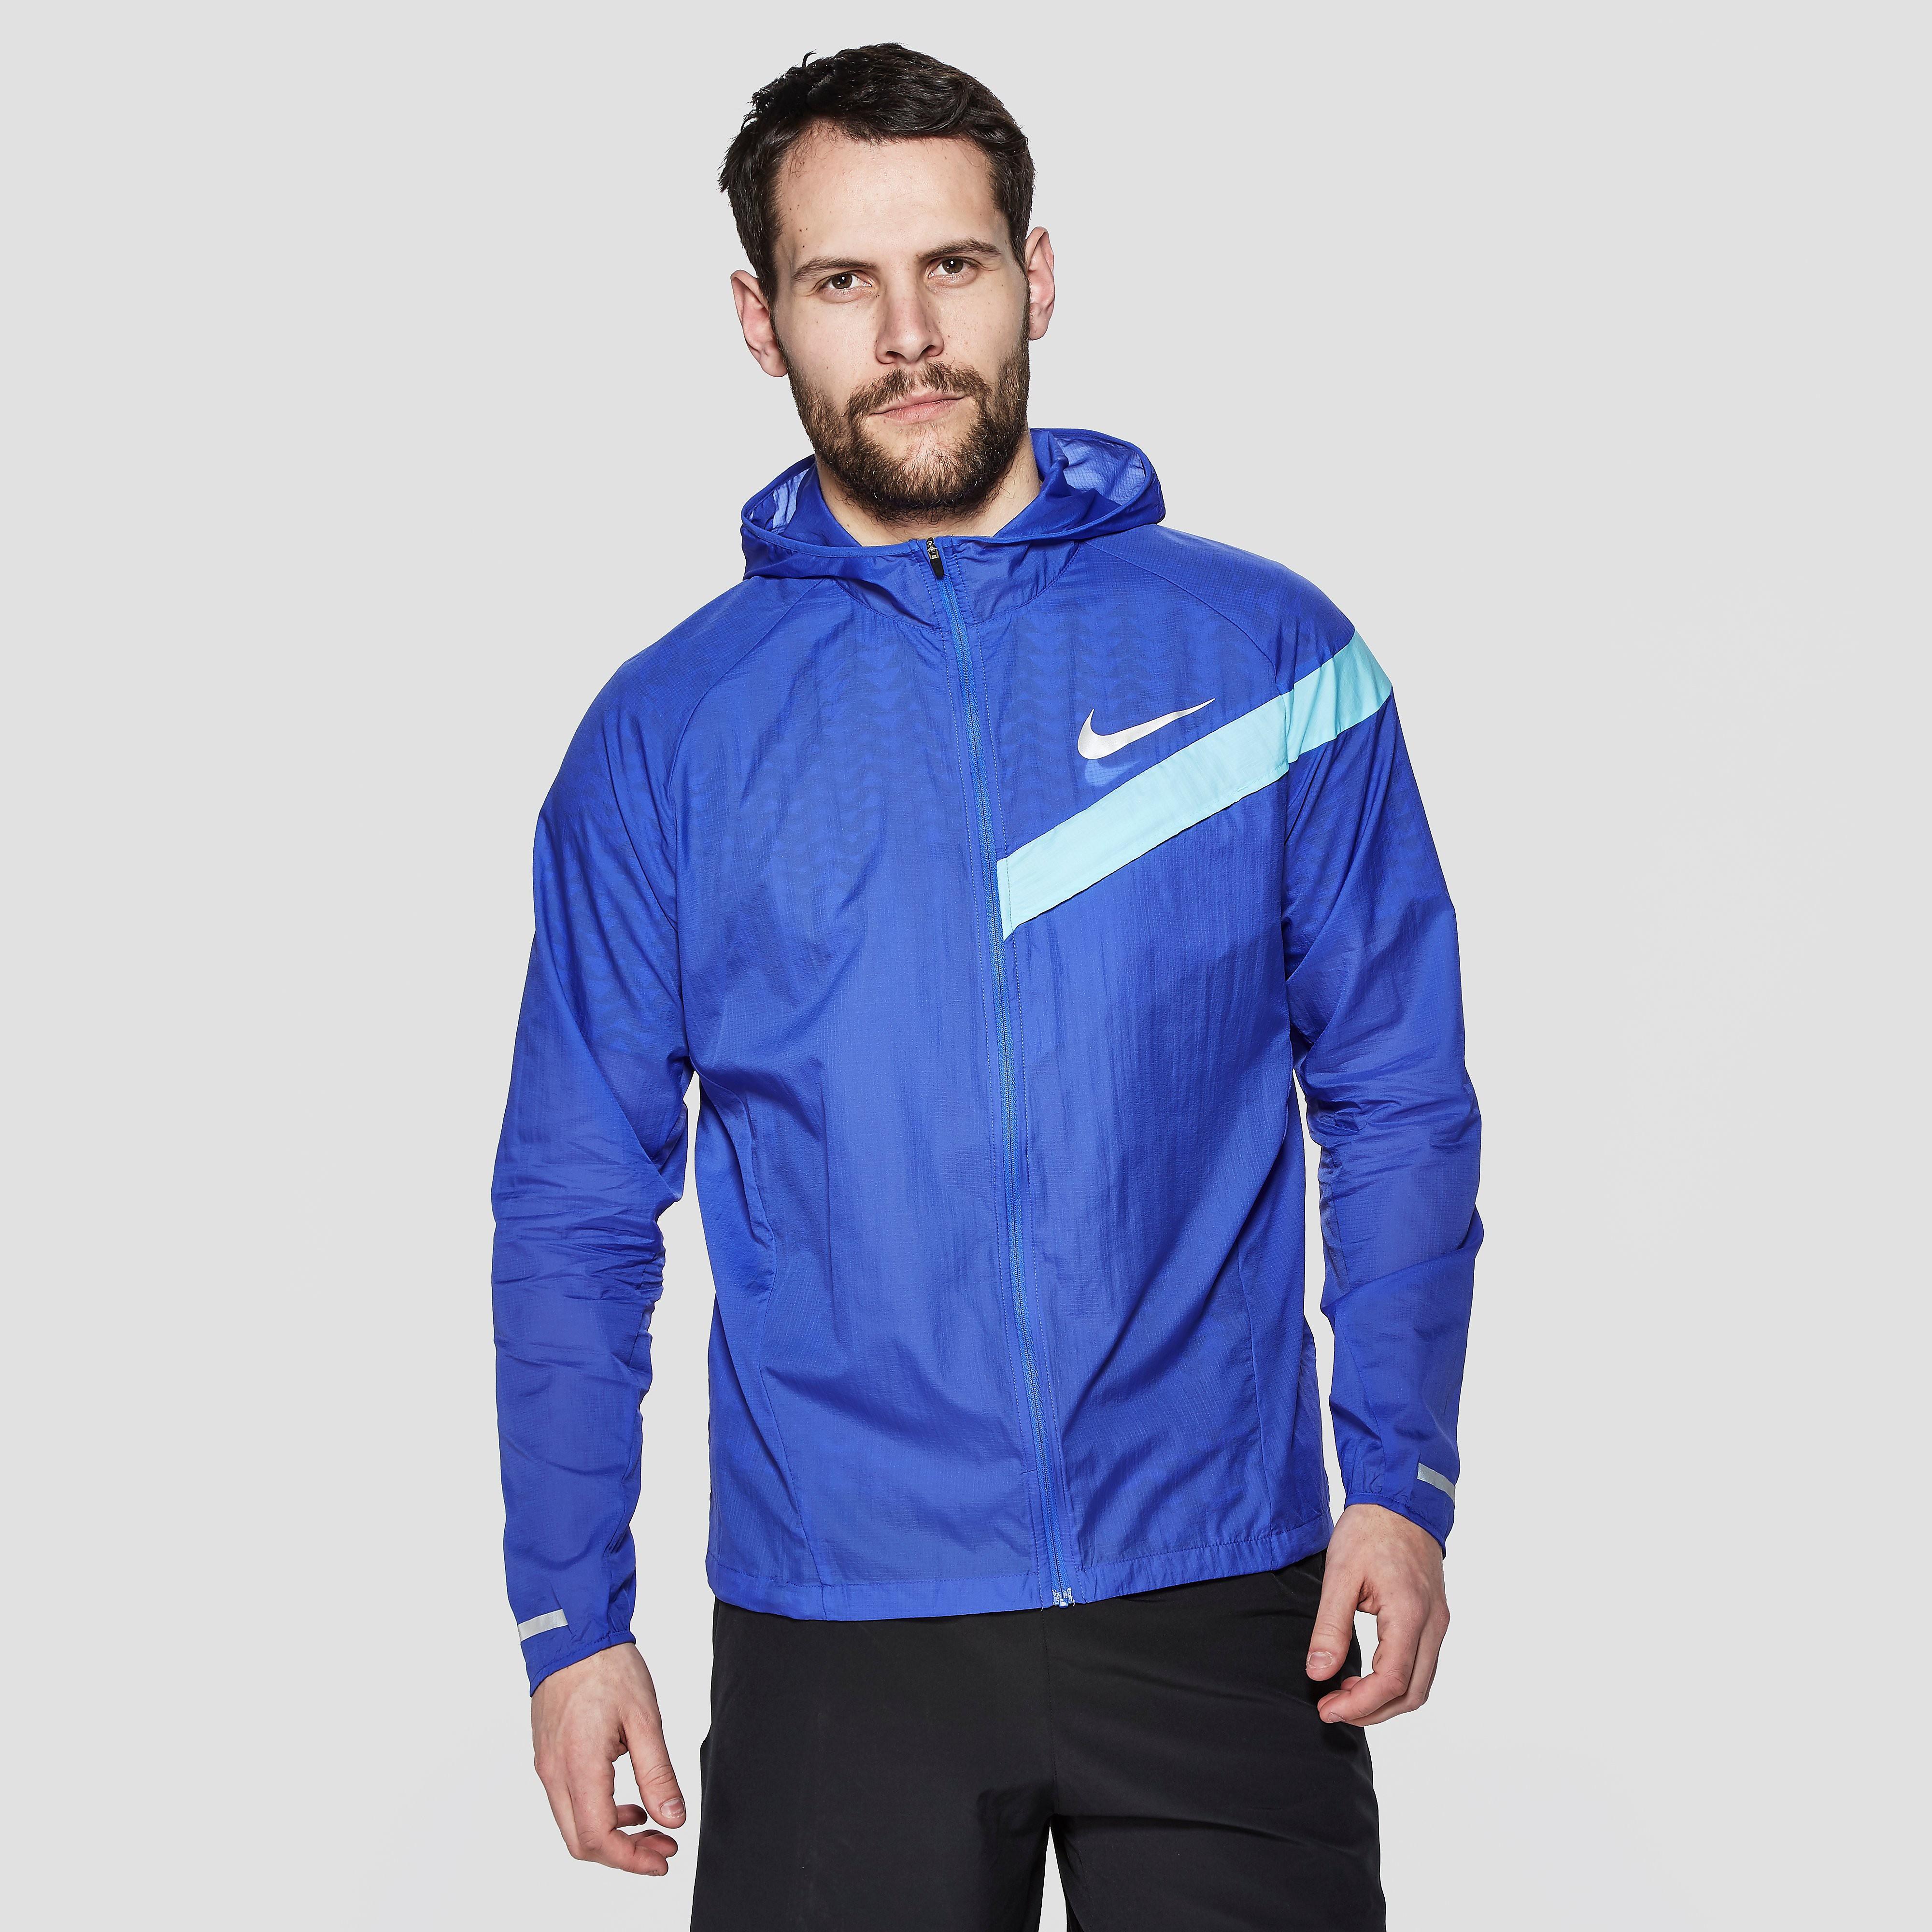 Nike Impossibly Light Men's Jacket